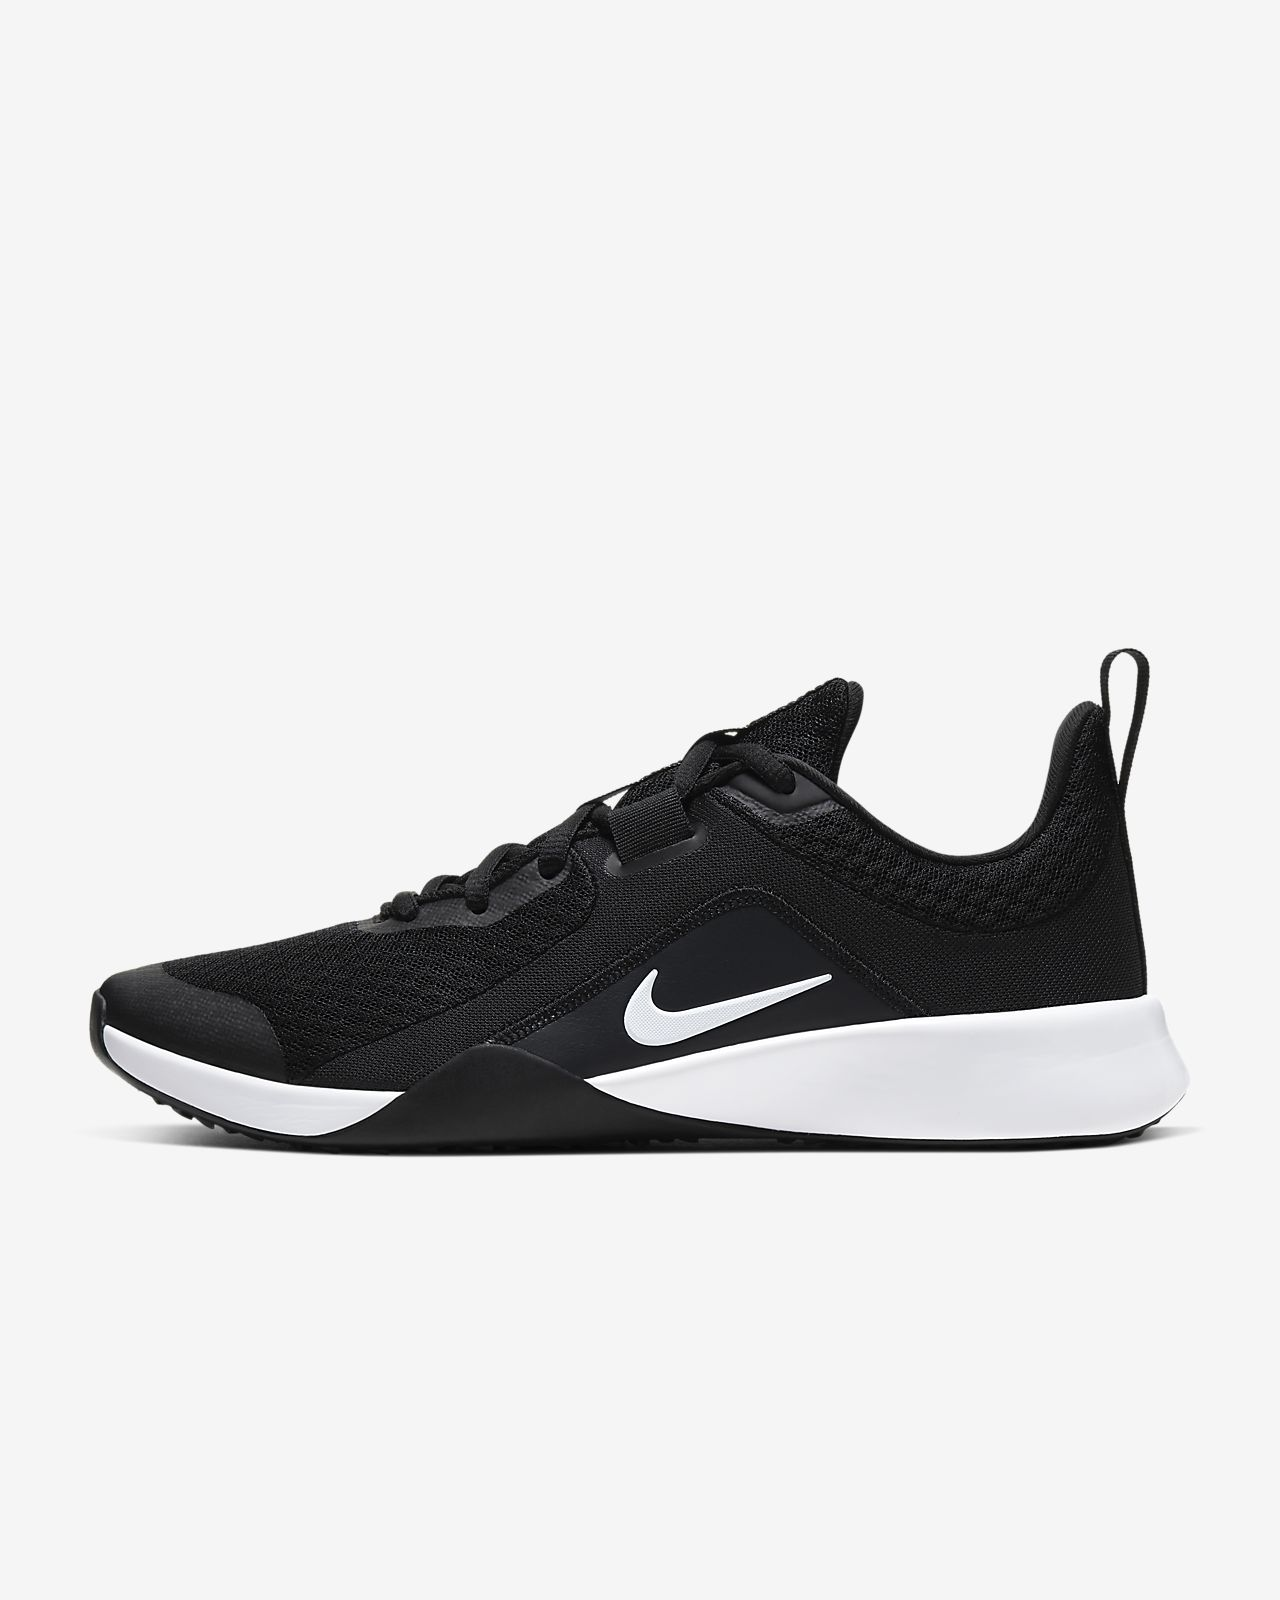 Dámská tréninková bota Nike Foundation Elite TR 2